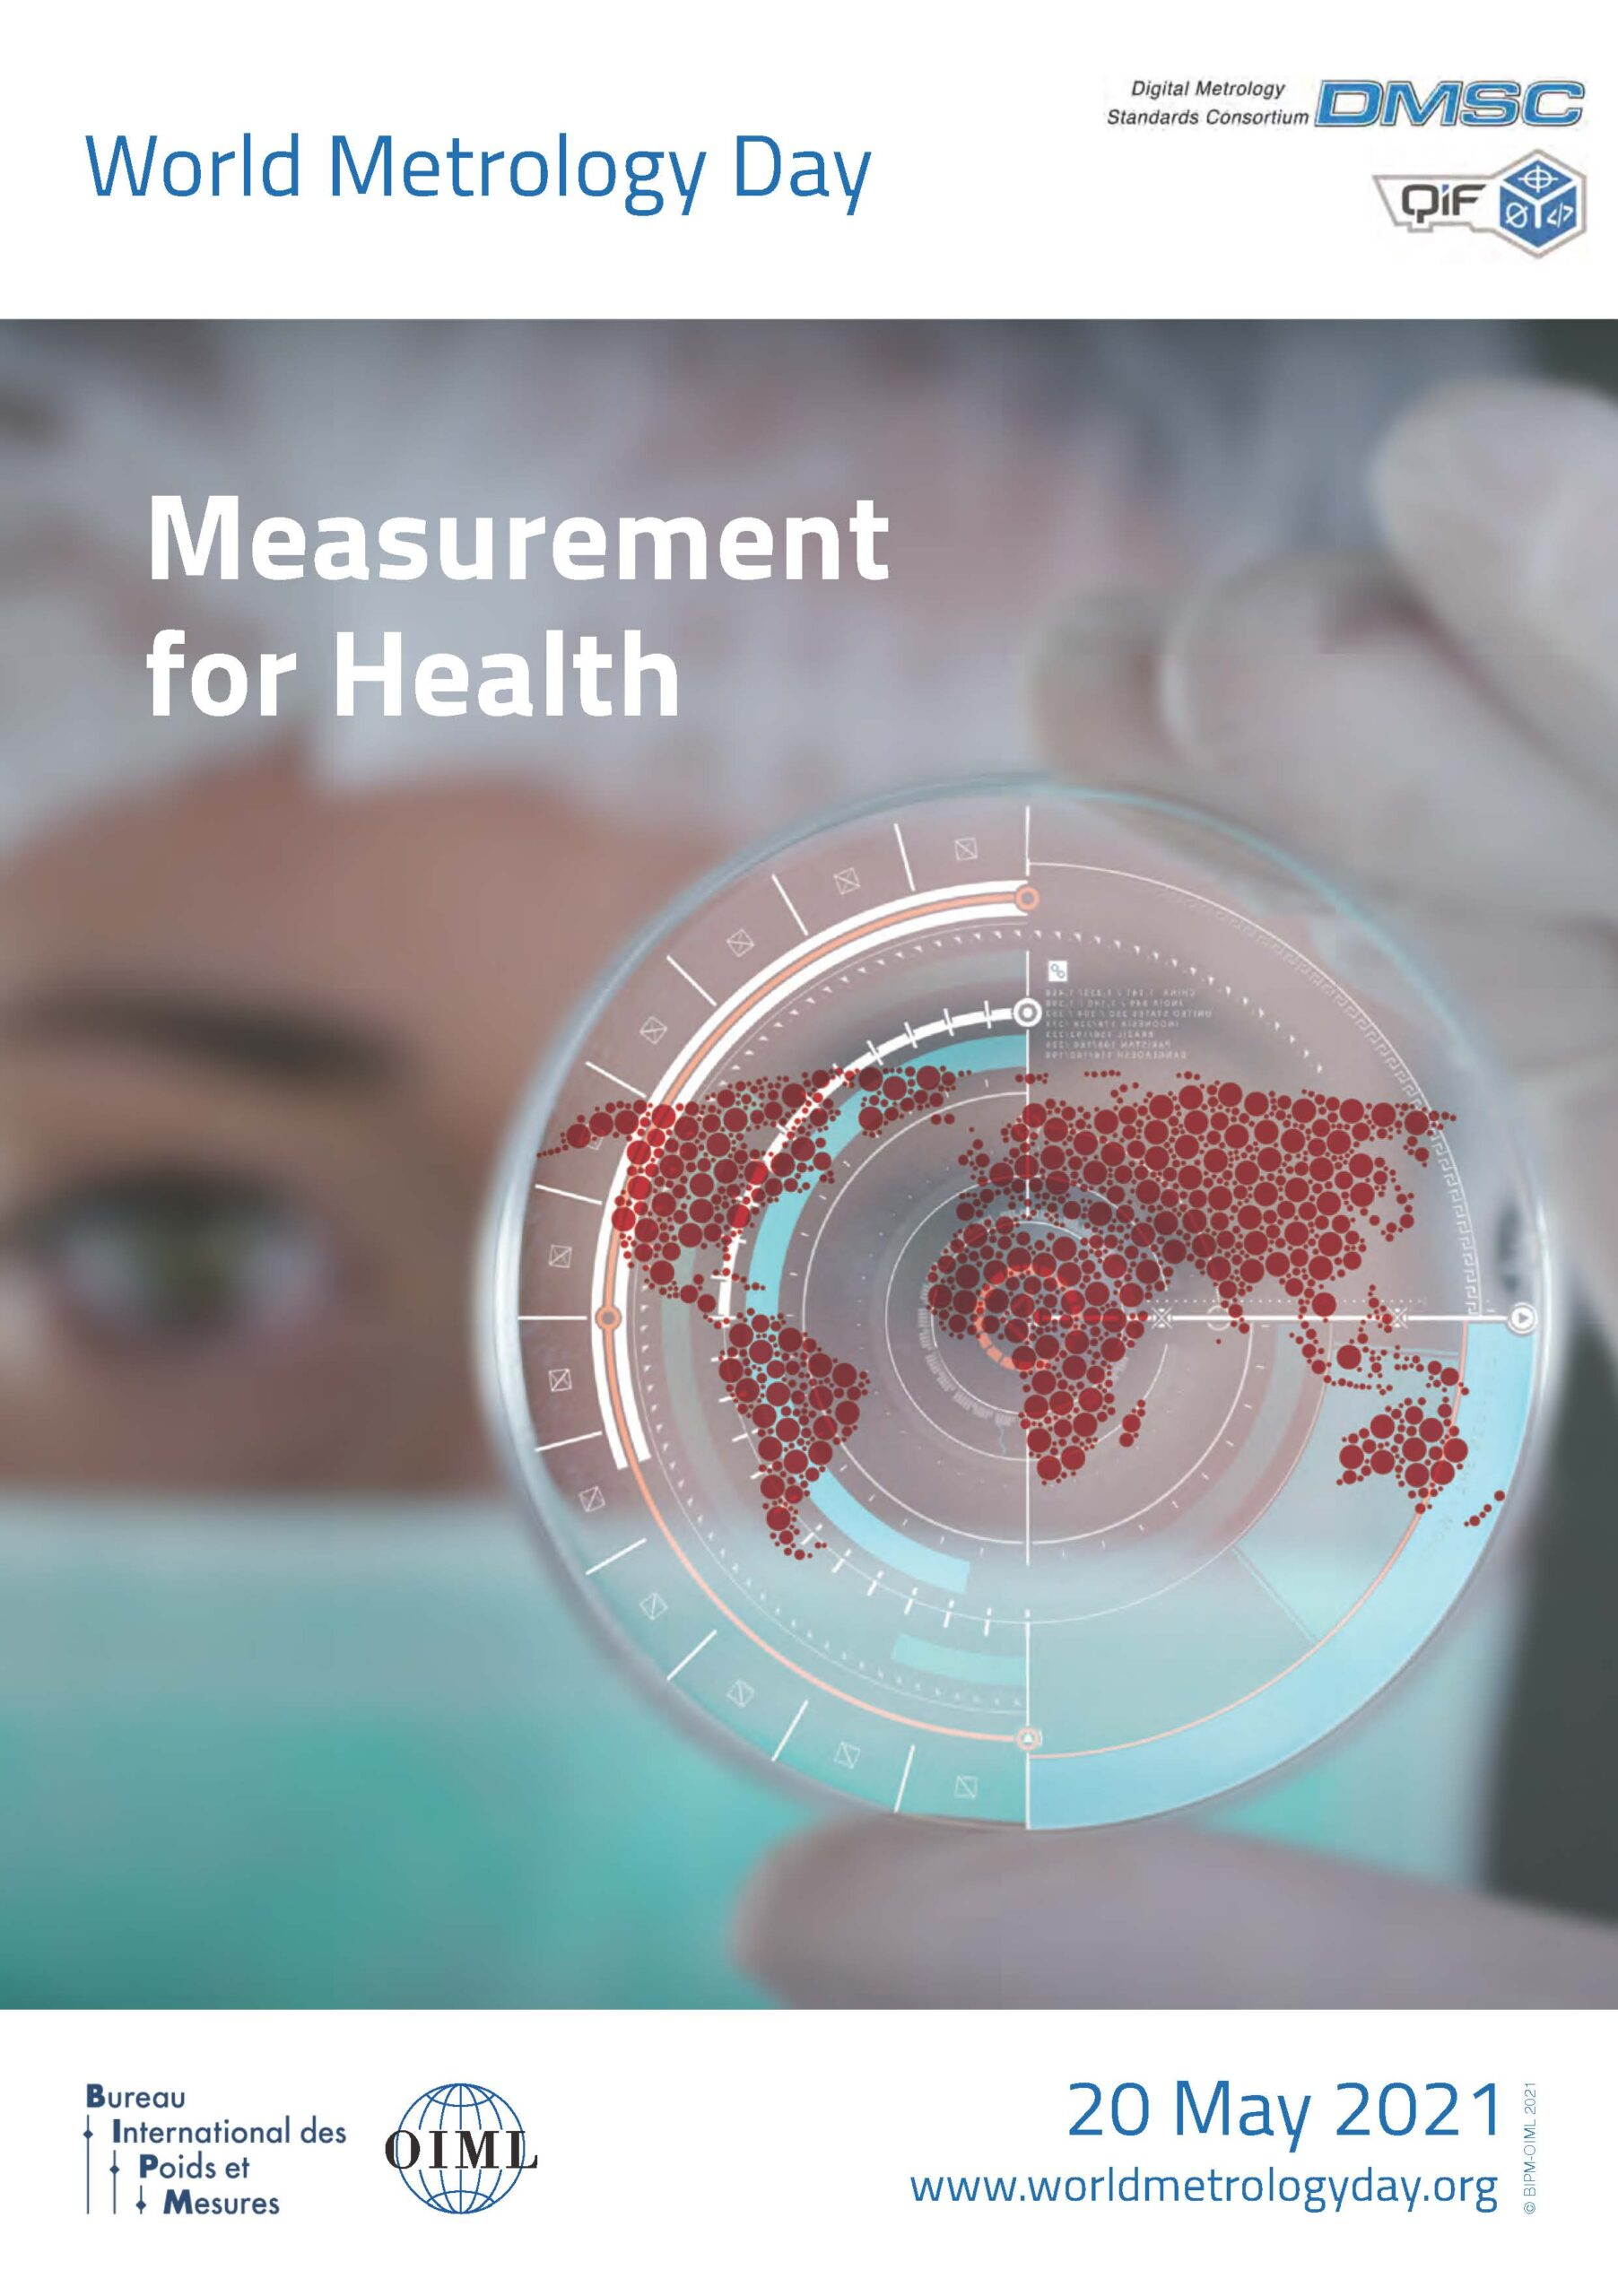 World Metrology Day 2021 Celebrates Measurement for Health